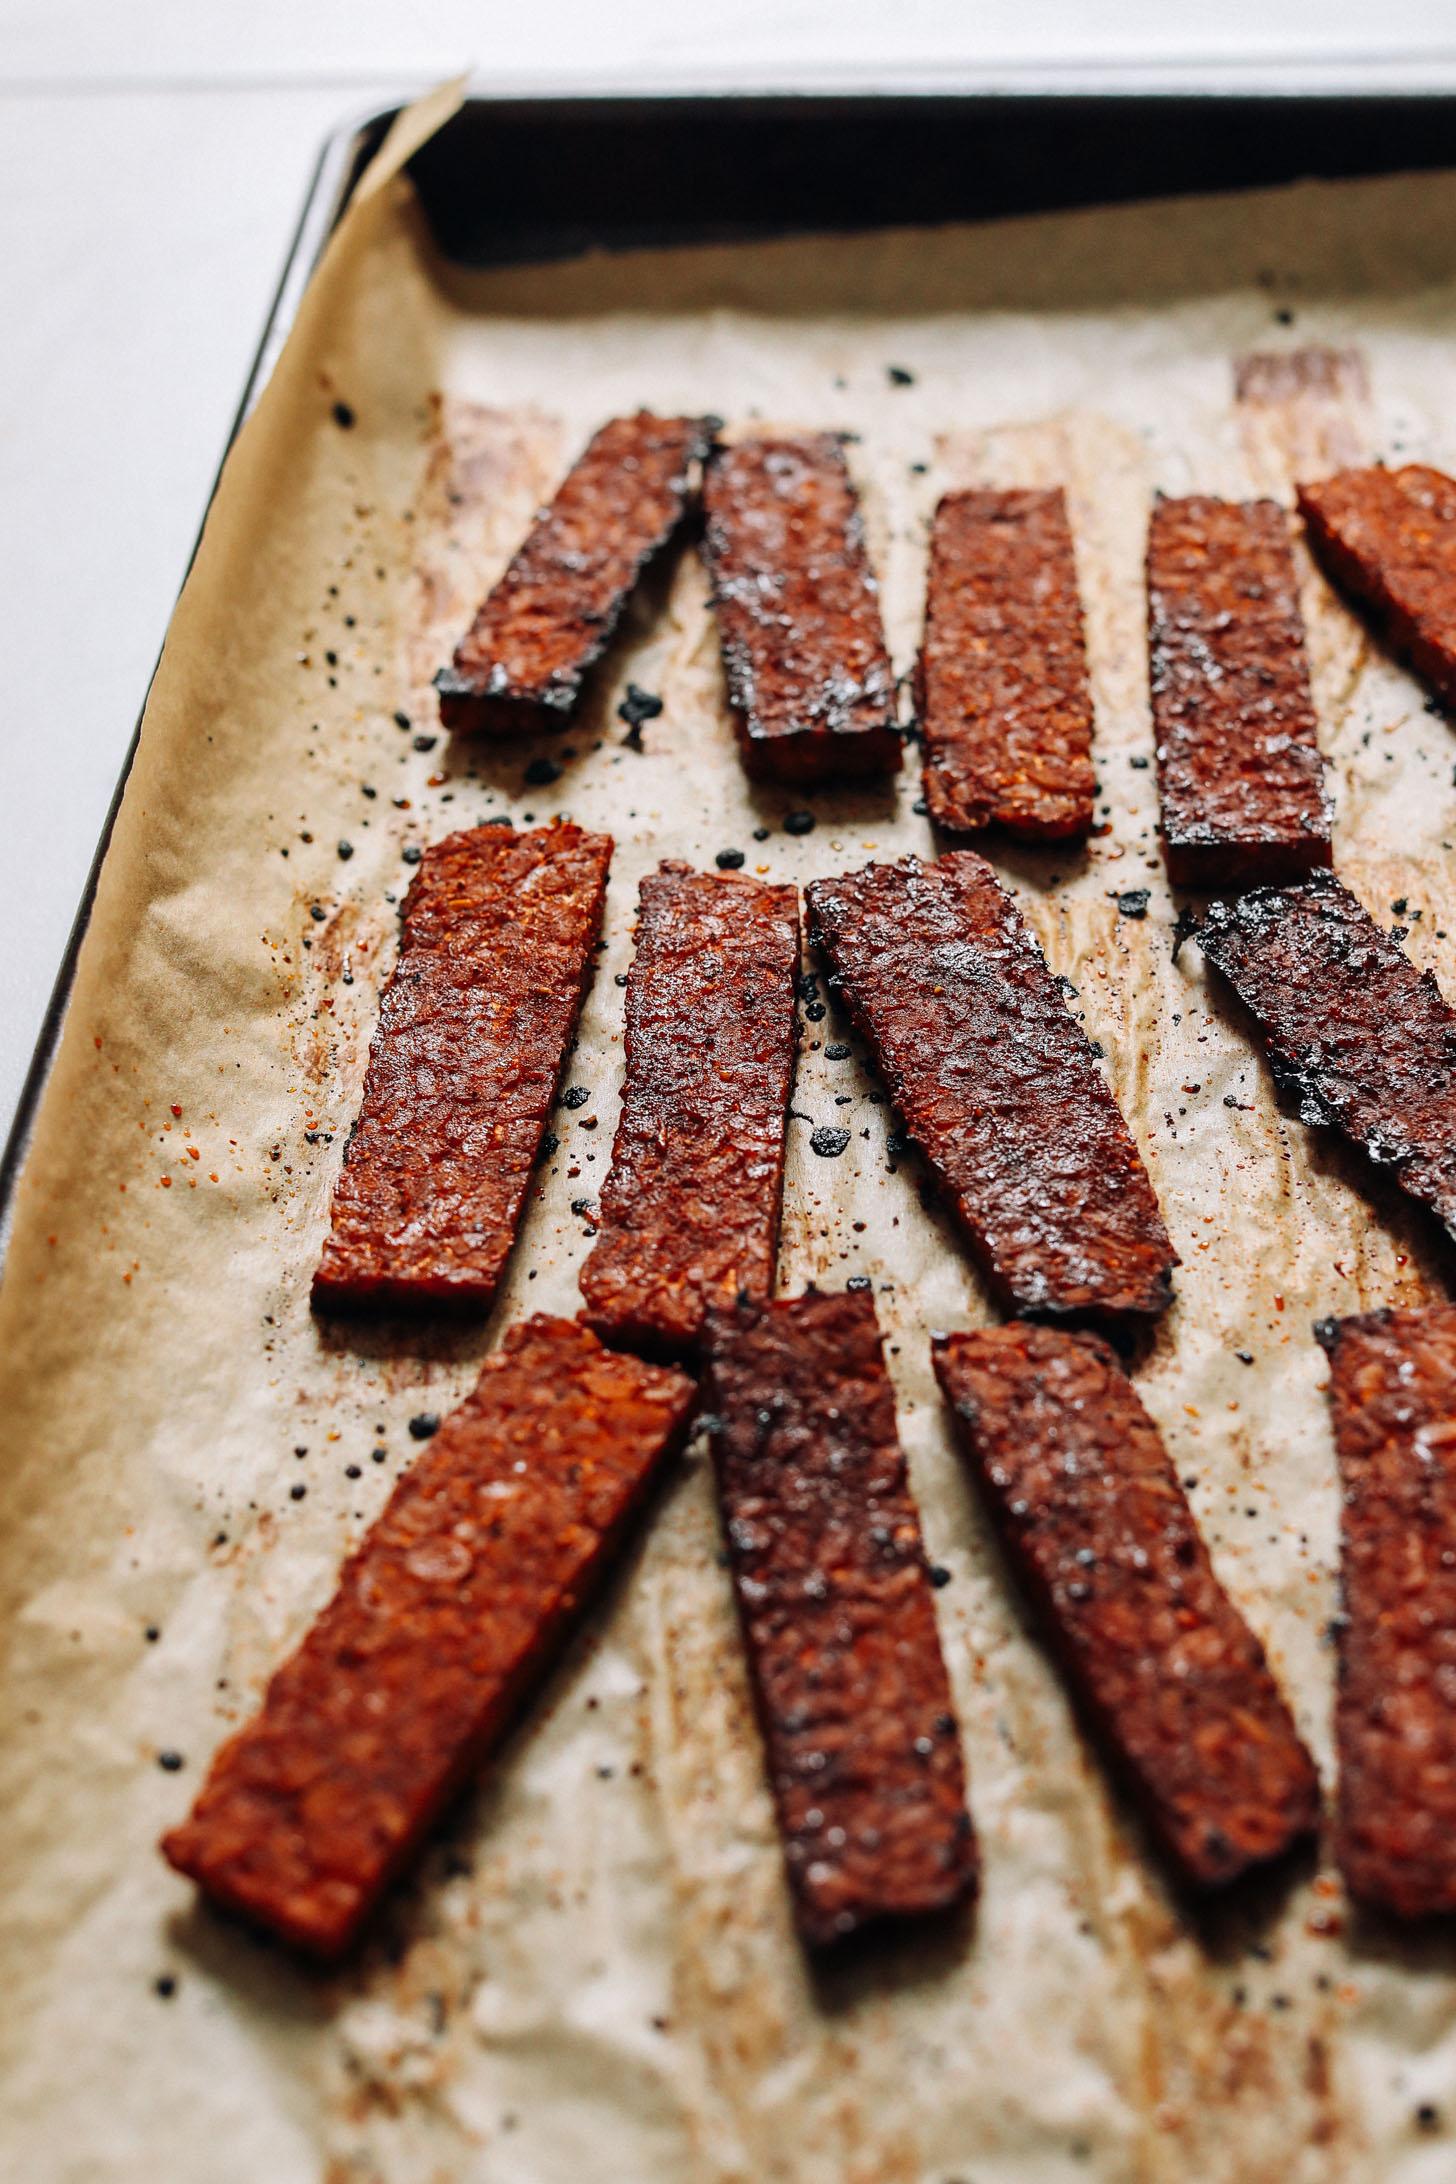 Strips of crispy tempeh bacon on a baking sheet